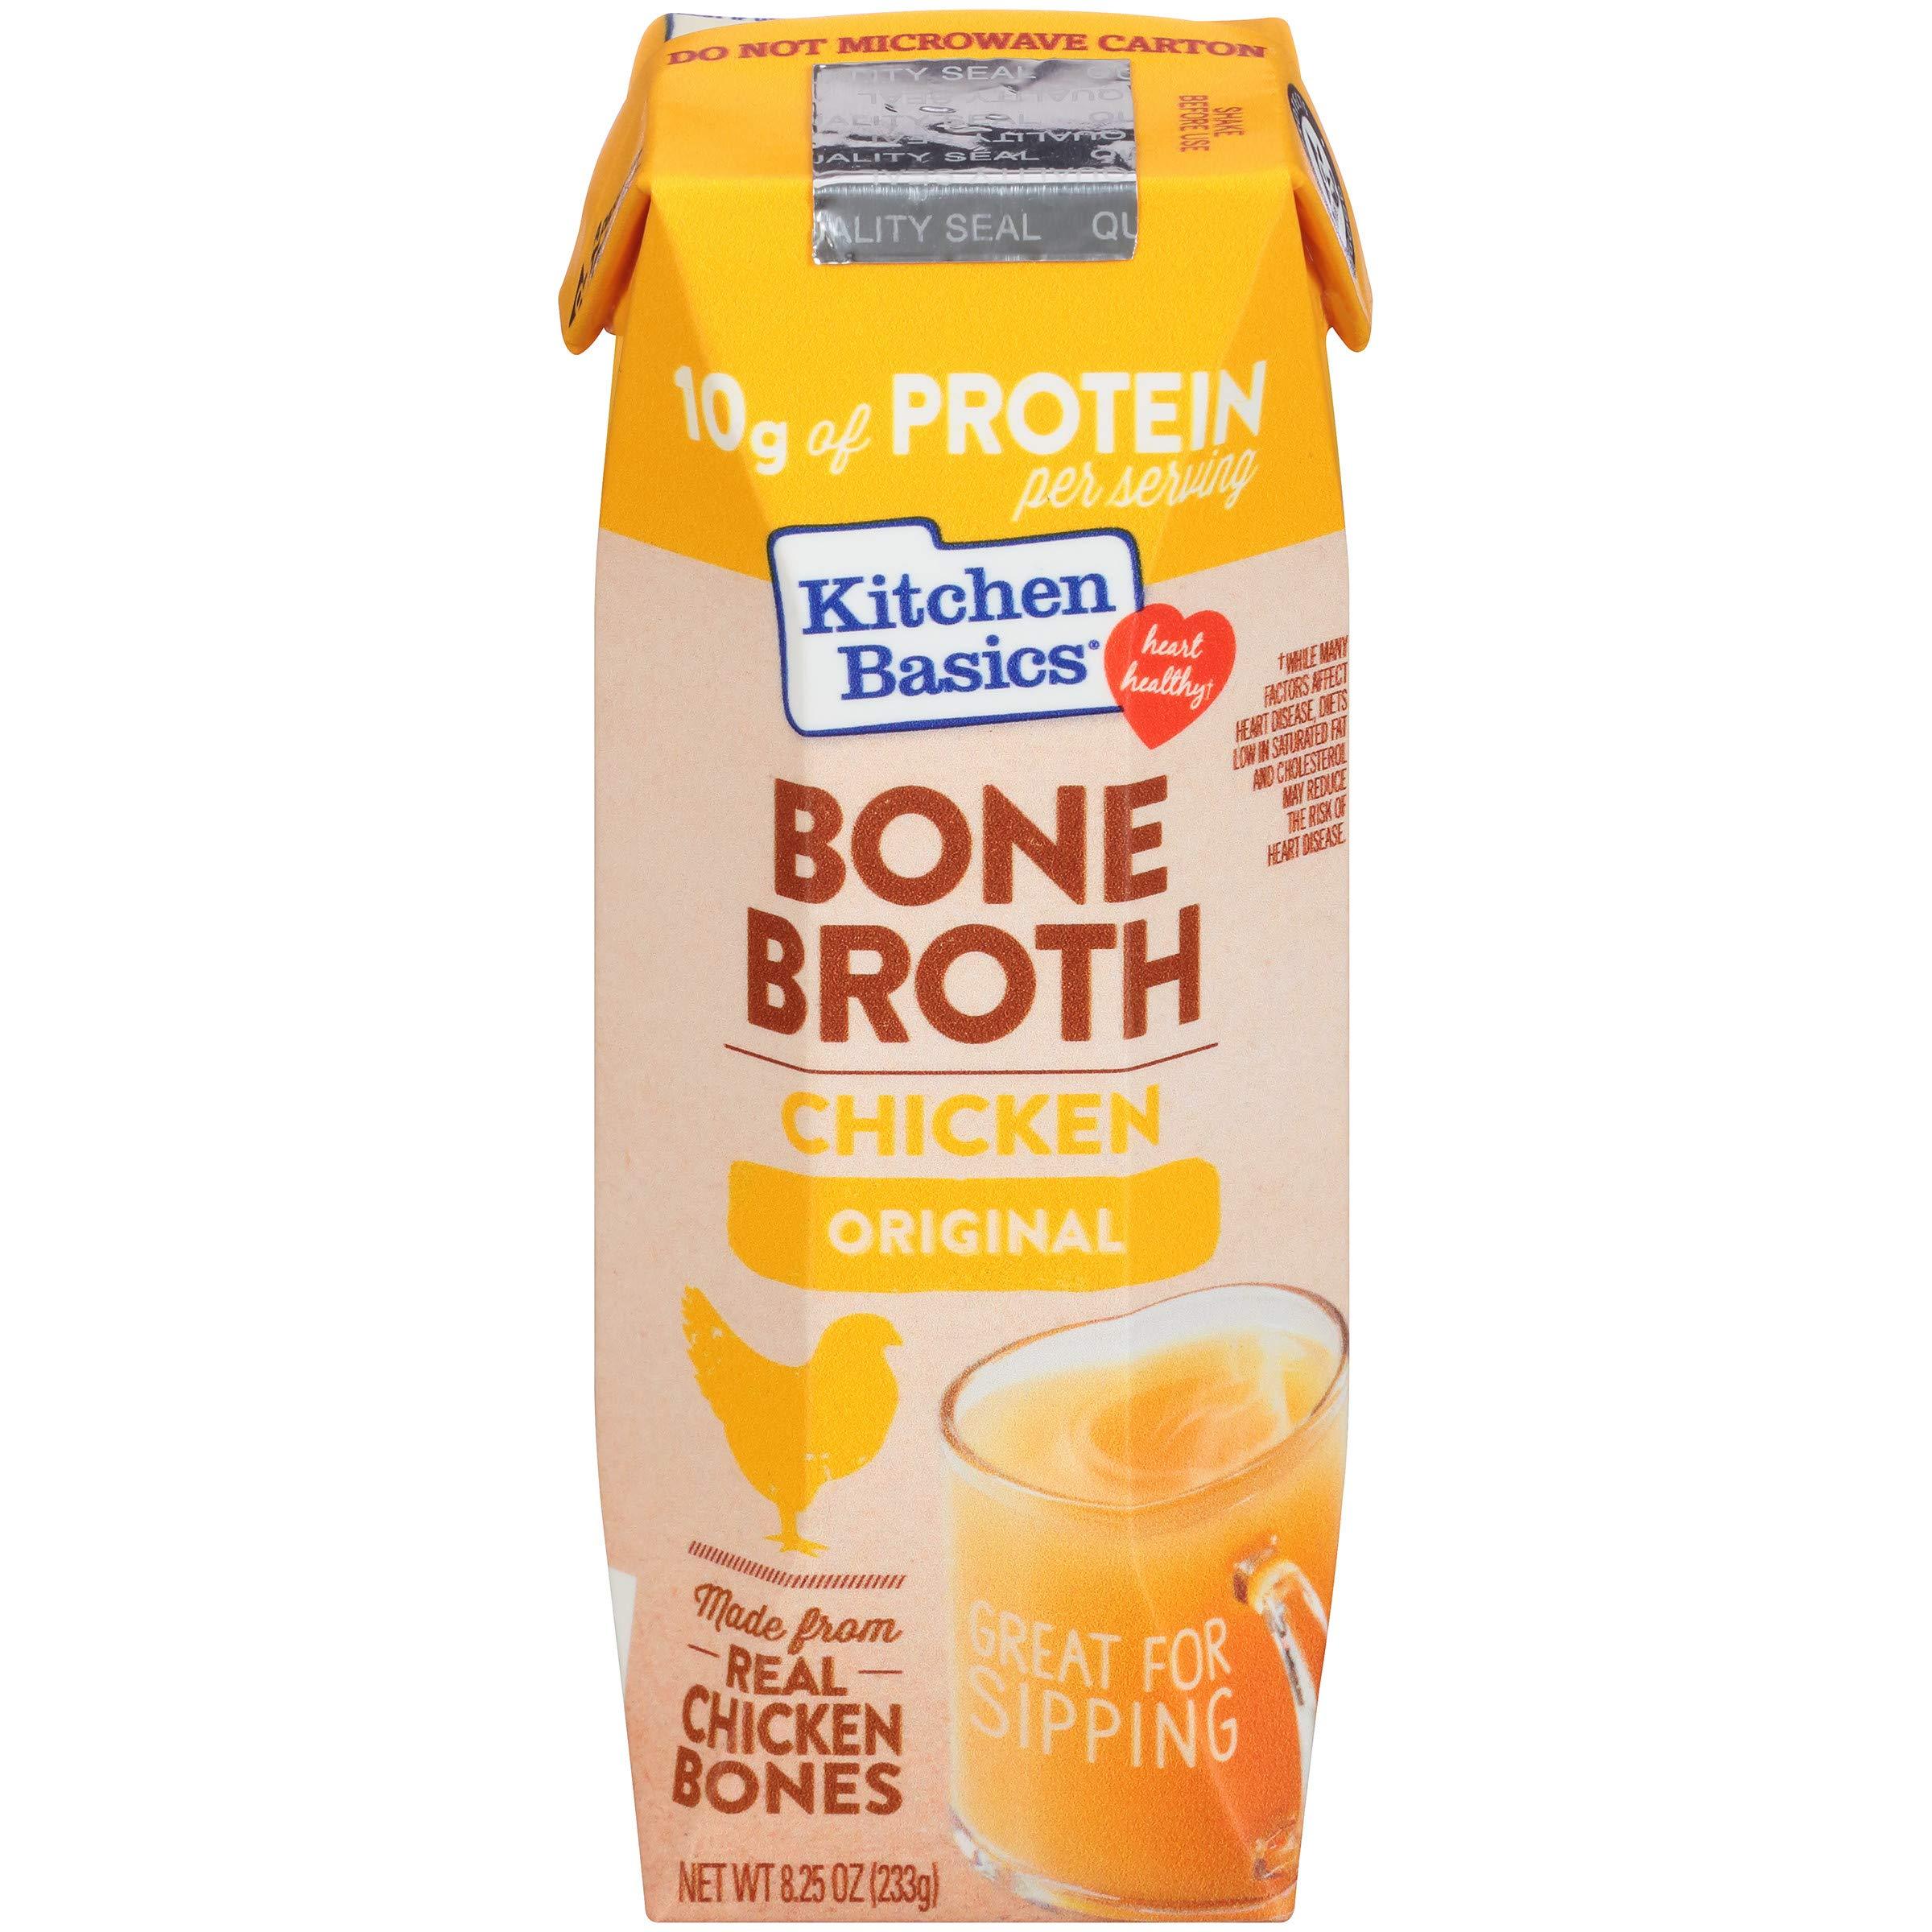 Kitchen Basics Original Chicken Bone Broth, 8.25 fl oz